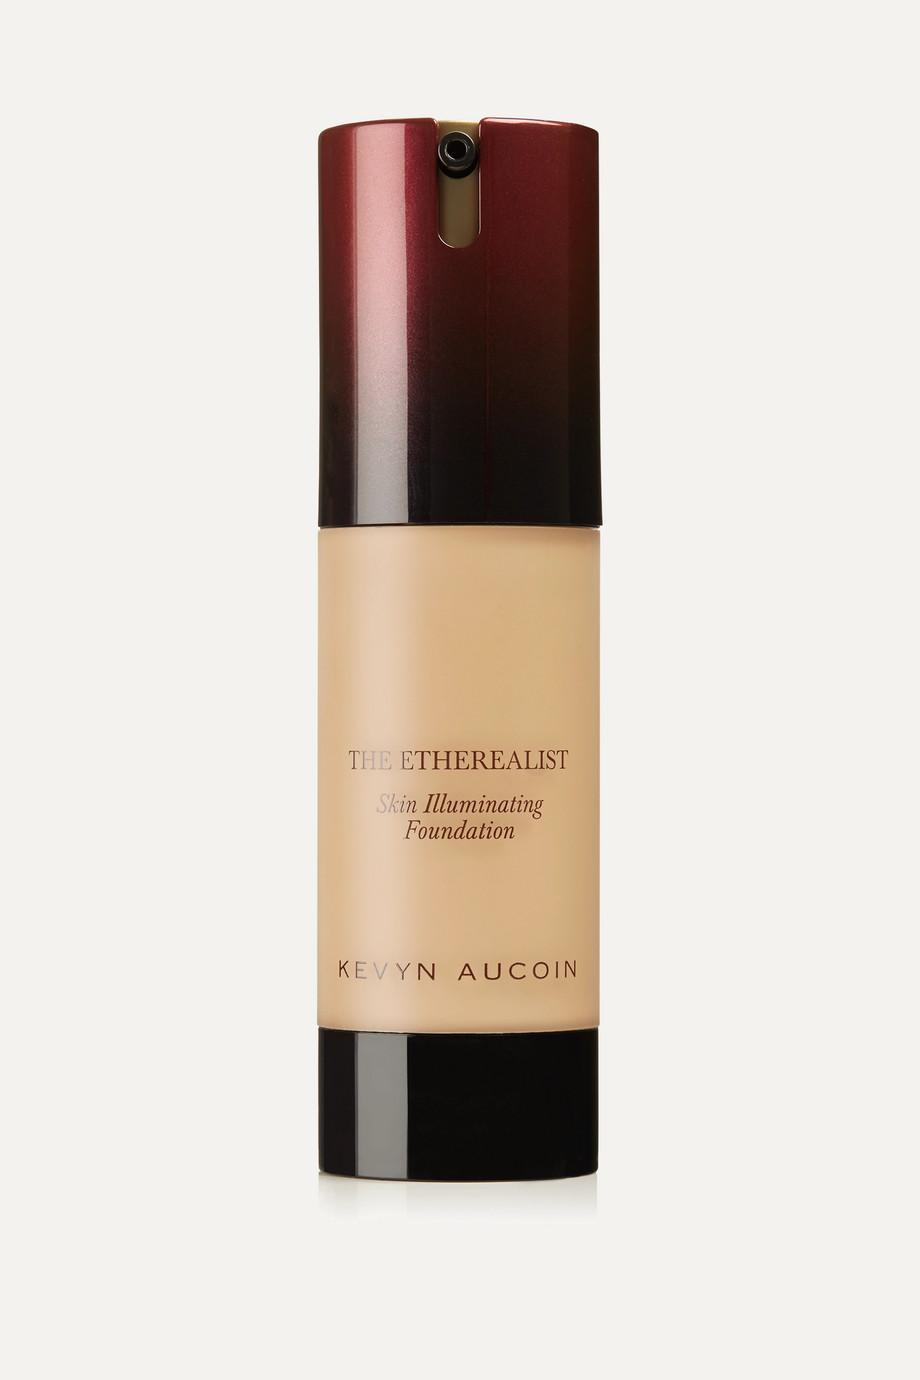 Kevyn Aucoin The Etherealist Skin Illuminating Foundation - Medium EF06